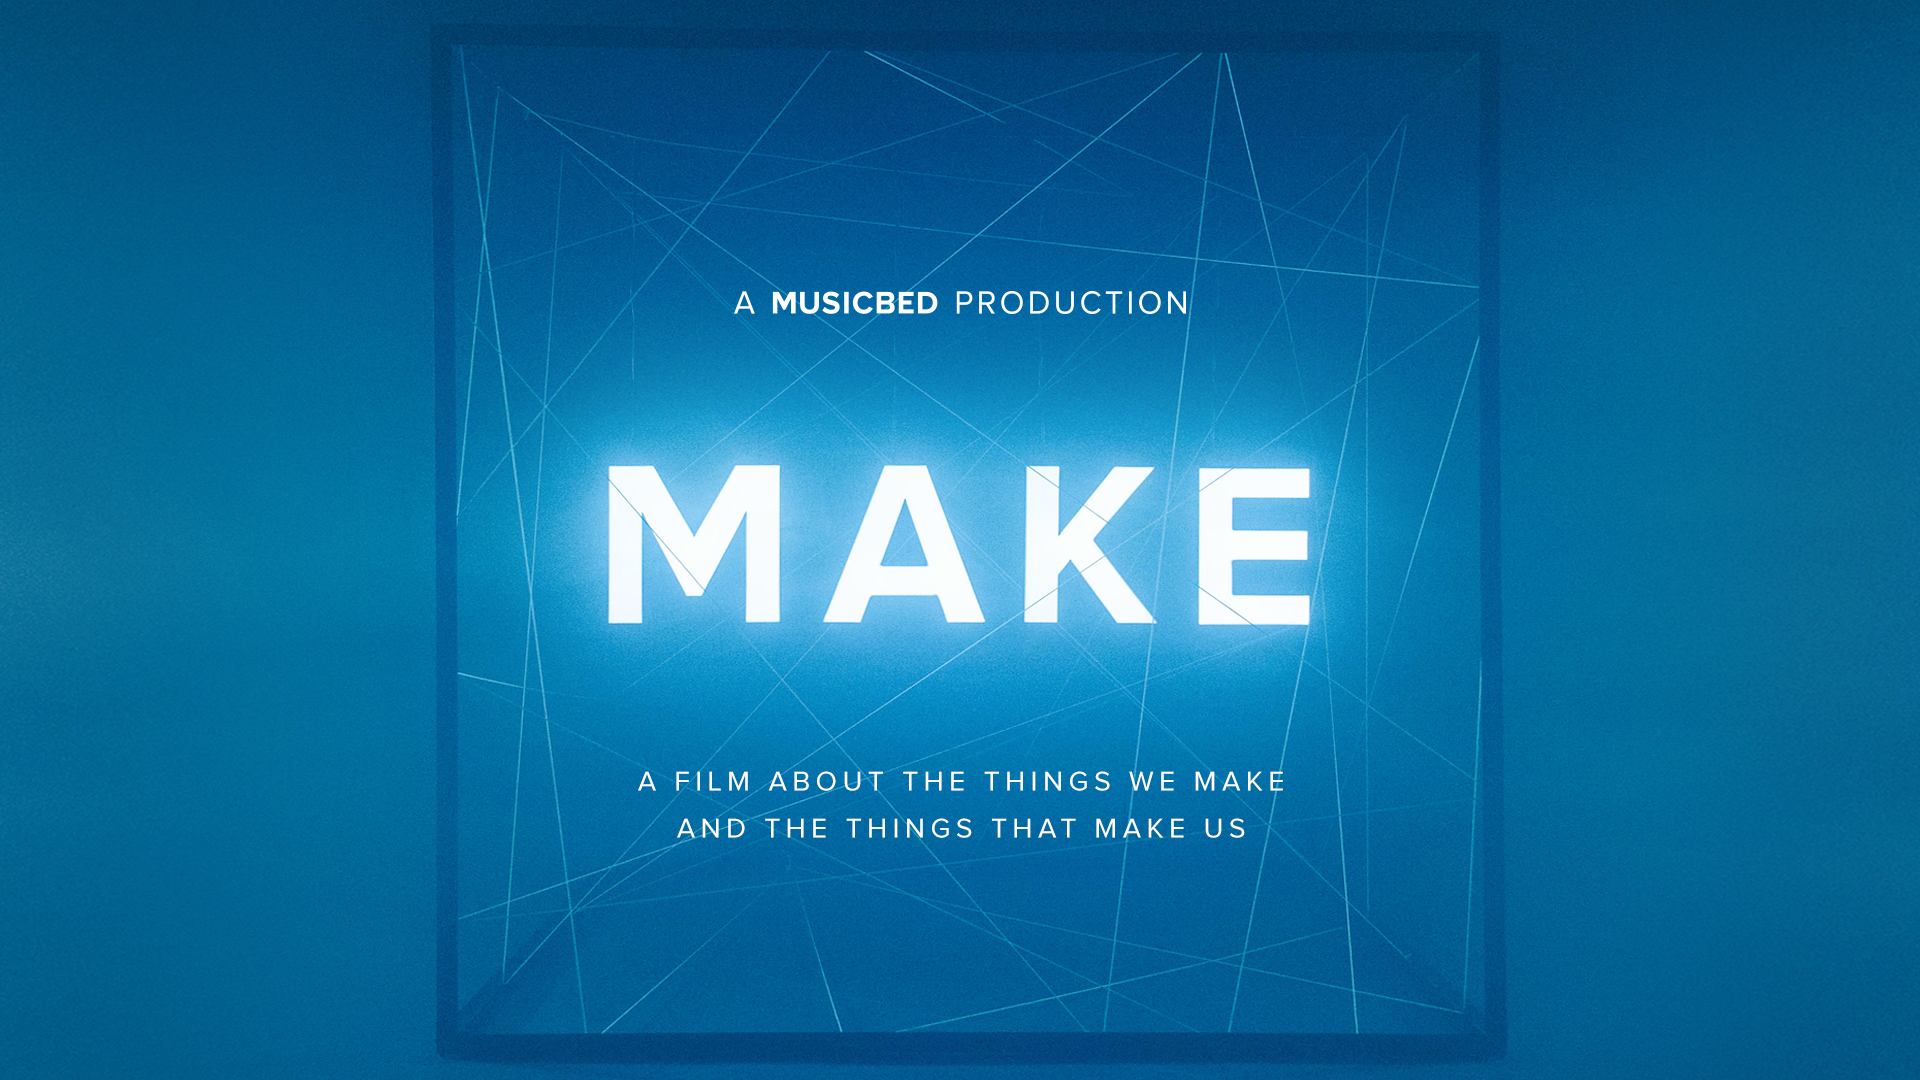 make-documentary-musicbed